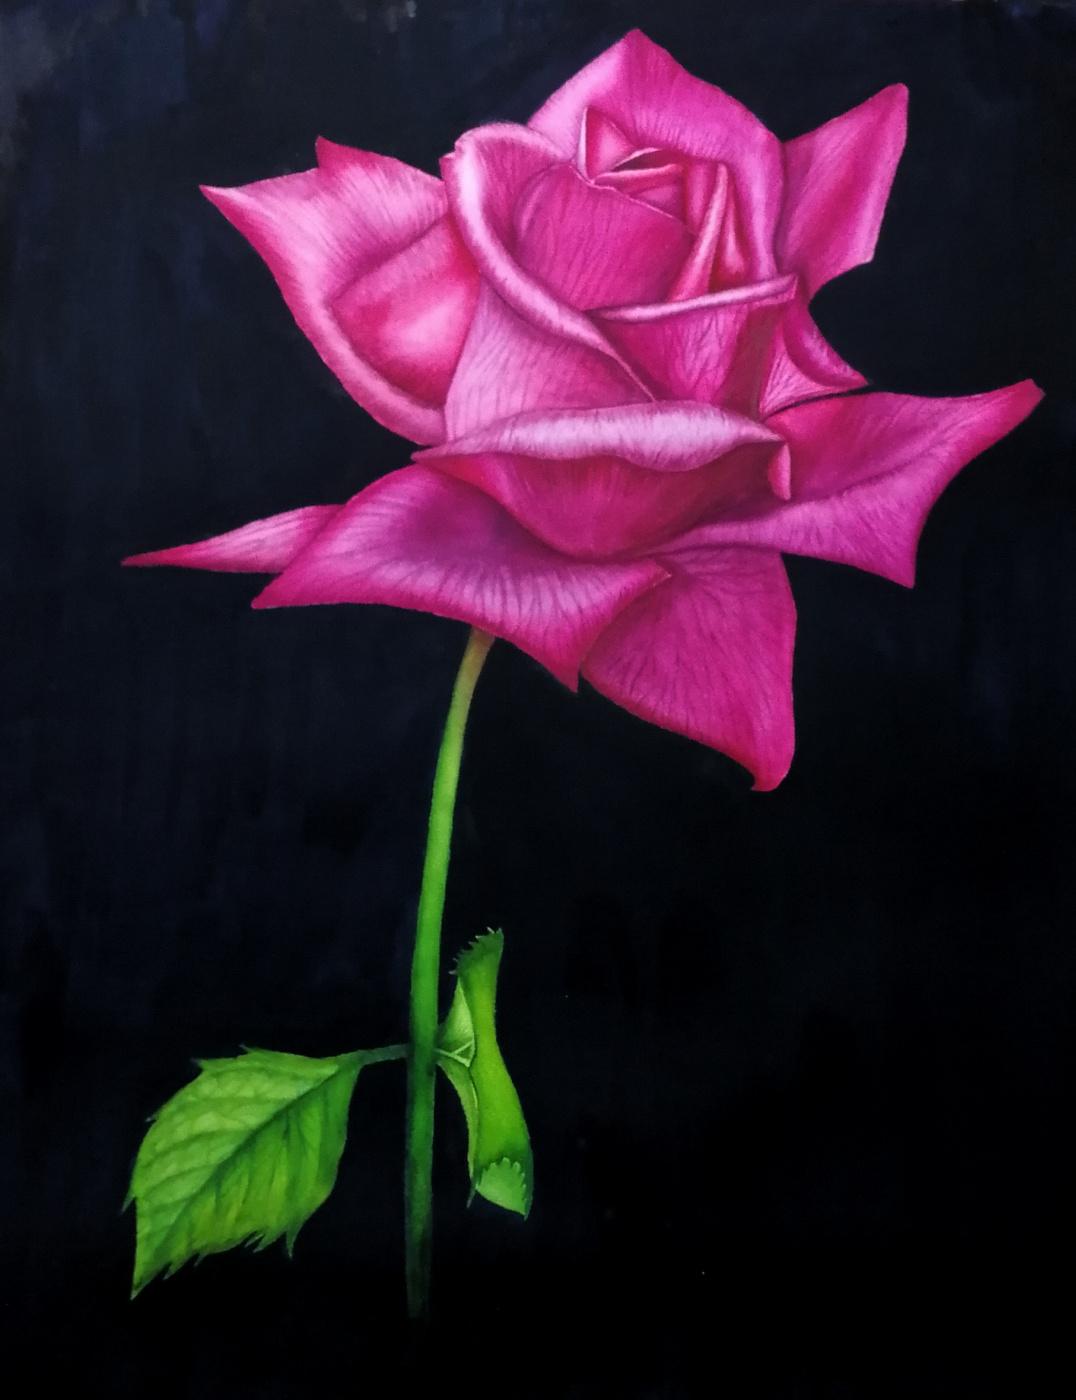 Alyona Anichkina. Rose on black